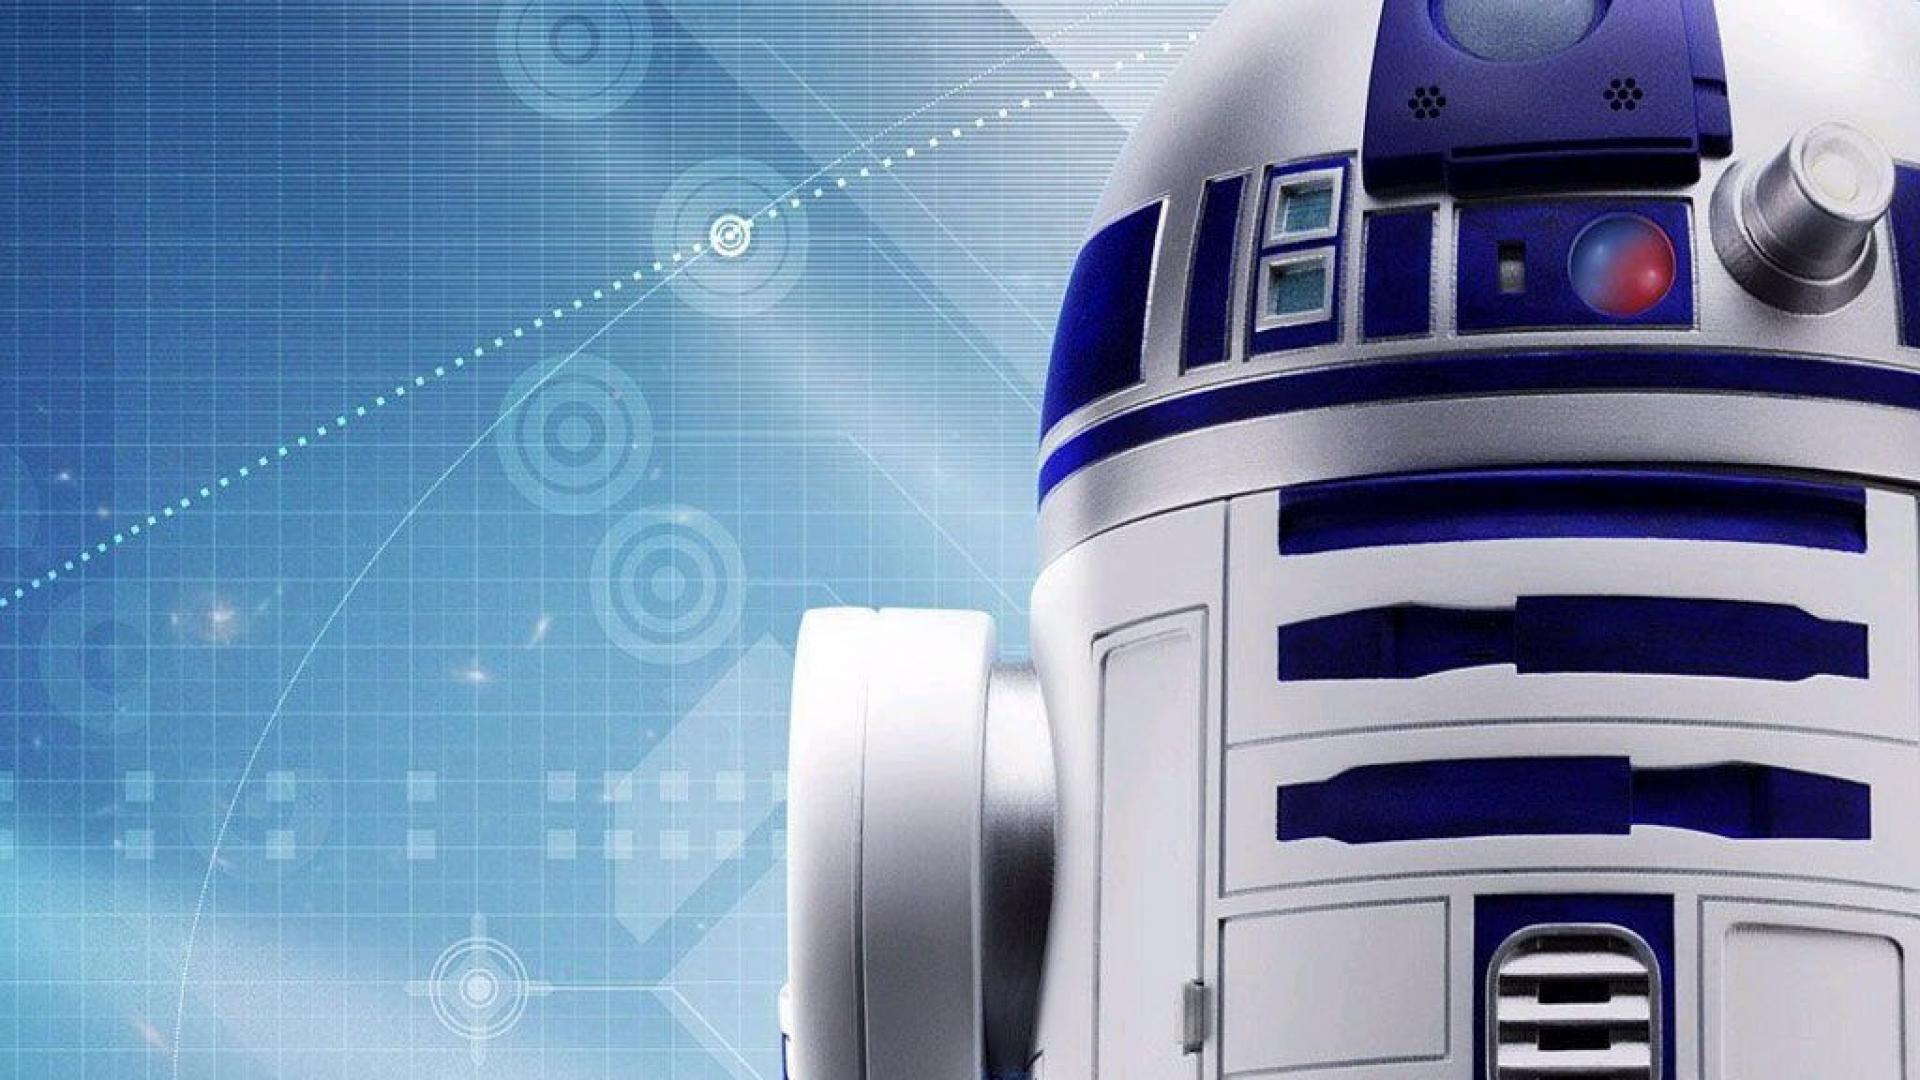 50 High Def Star Wars Wallpaper On Wallpapersafari